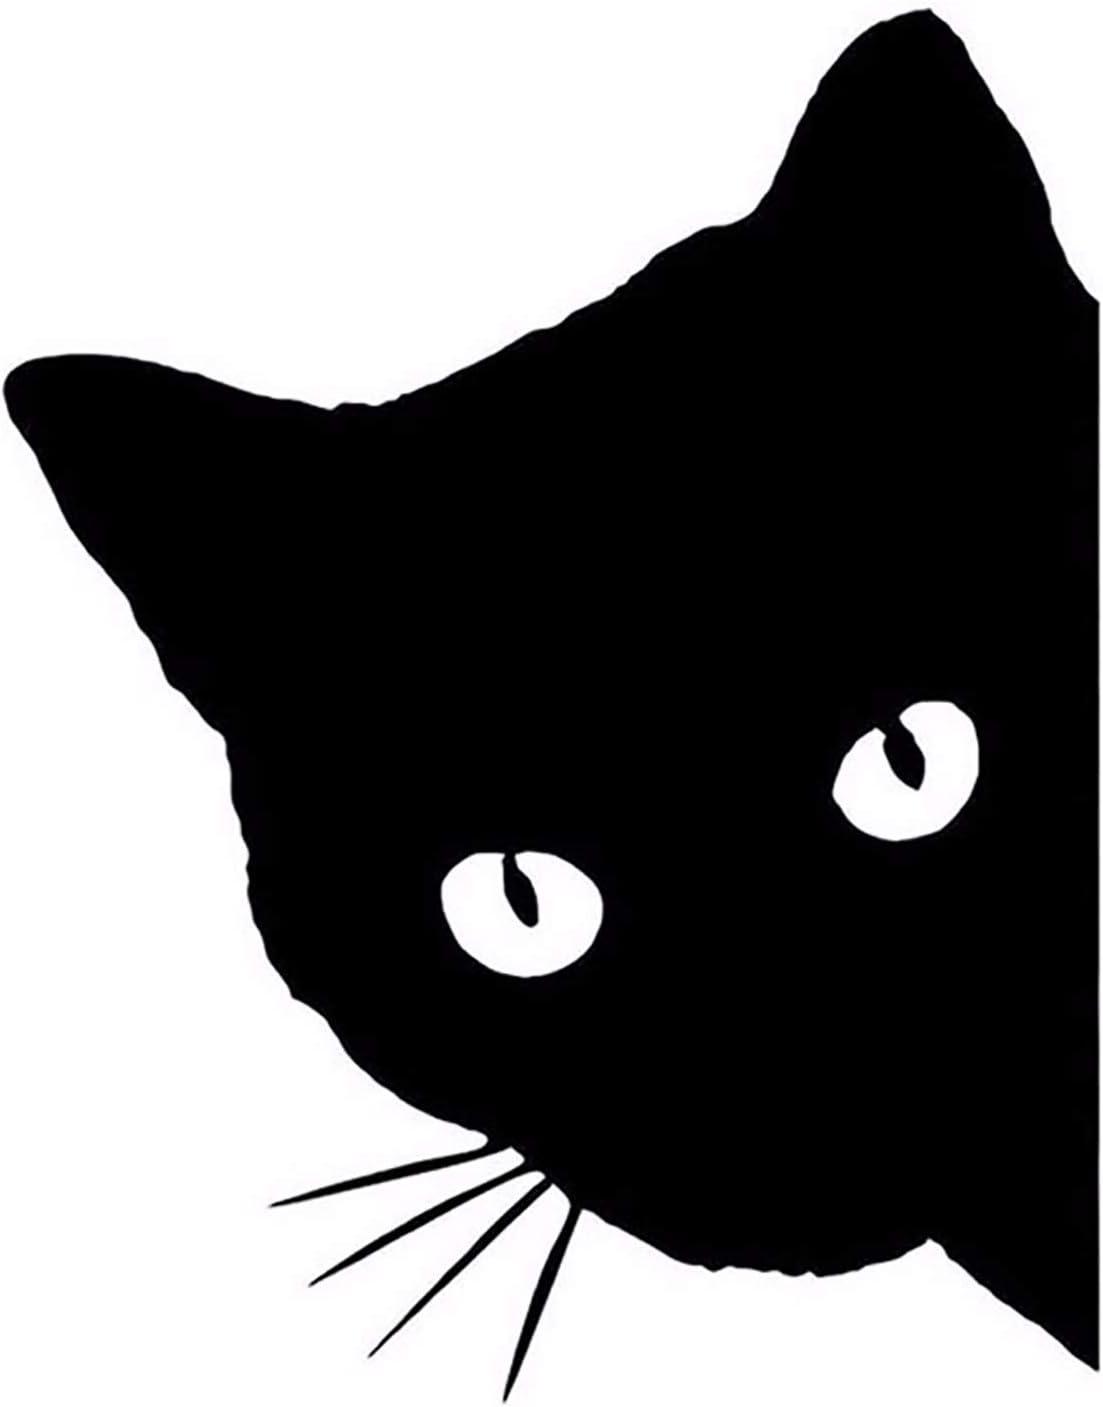 Amazon Com Toocust Reflective Cartoon Cat Lovely Cat Pet Cat Peeking Car Sticker 4 3x5 5 Inch Decal Sticker For Vehicle Car Truck Window Bumper Wall Decor Black Left Facing Automotive